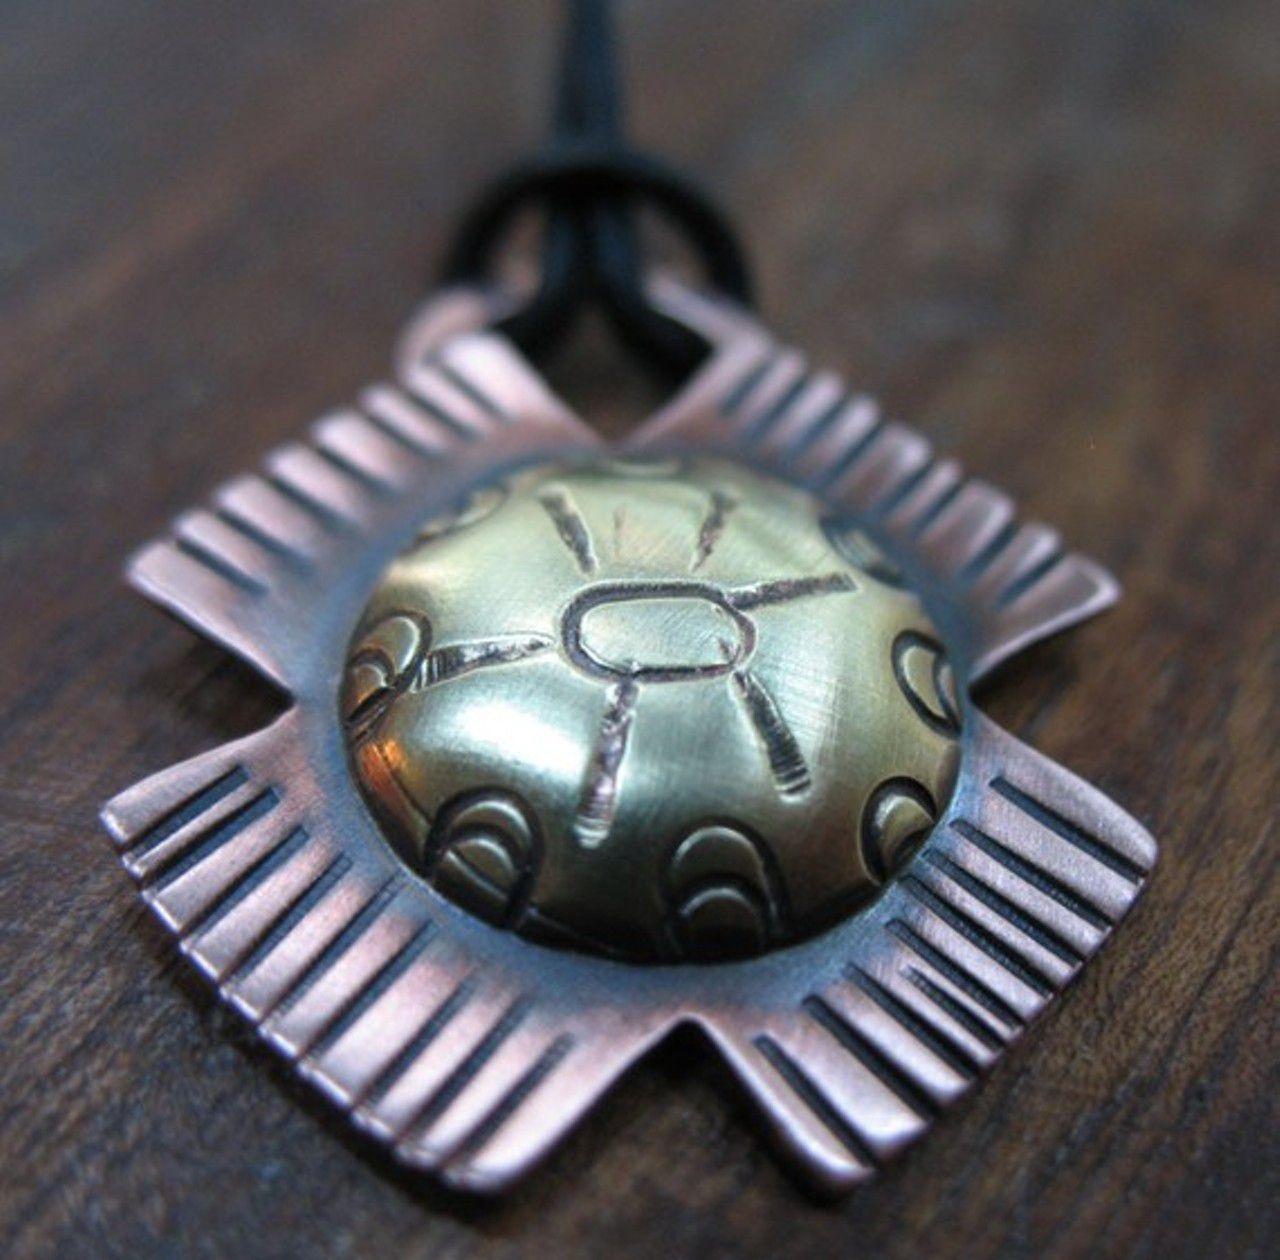 handmade masterclass abbiglievents abbigli howto workshop jewelry savannah